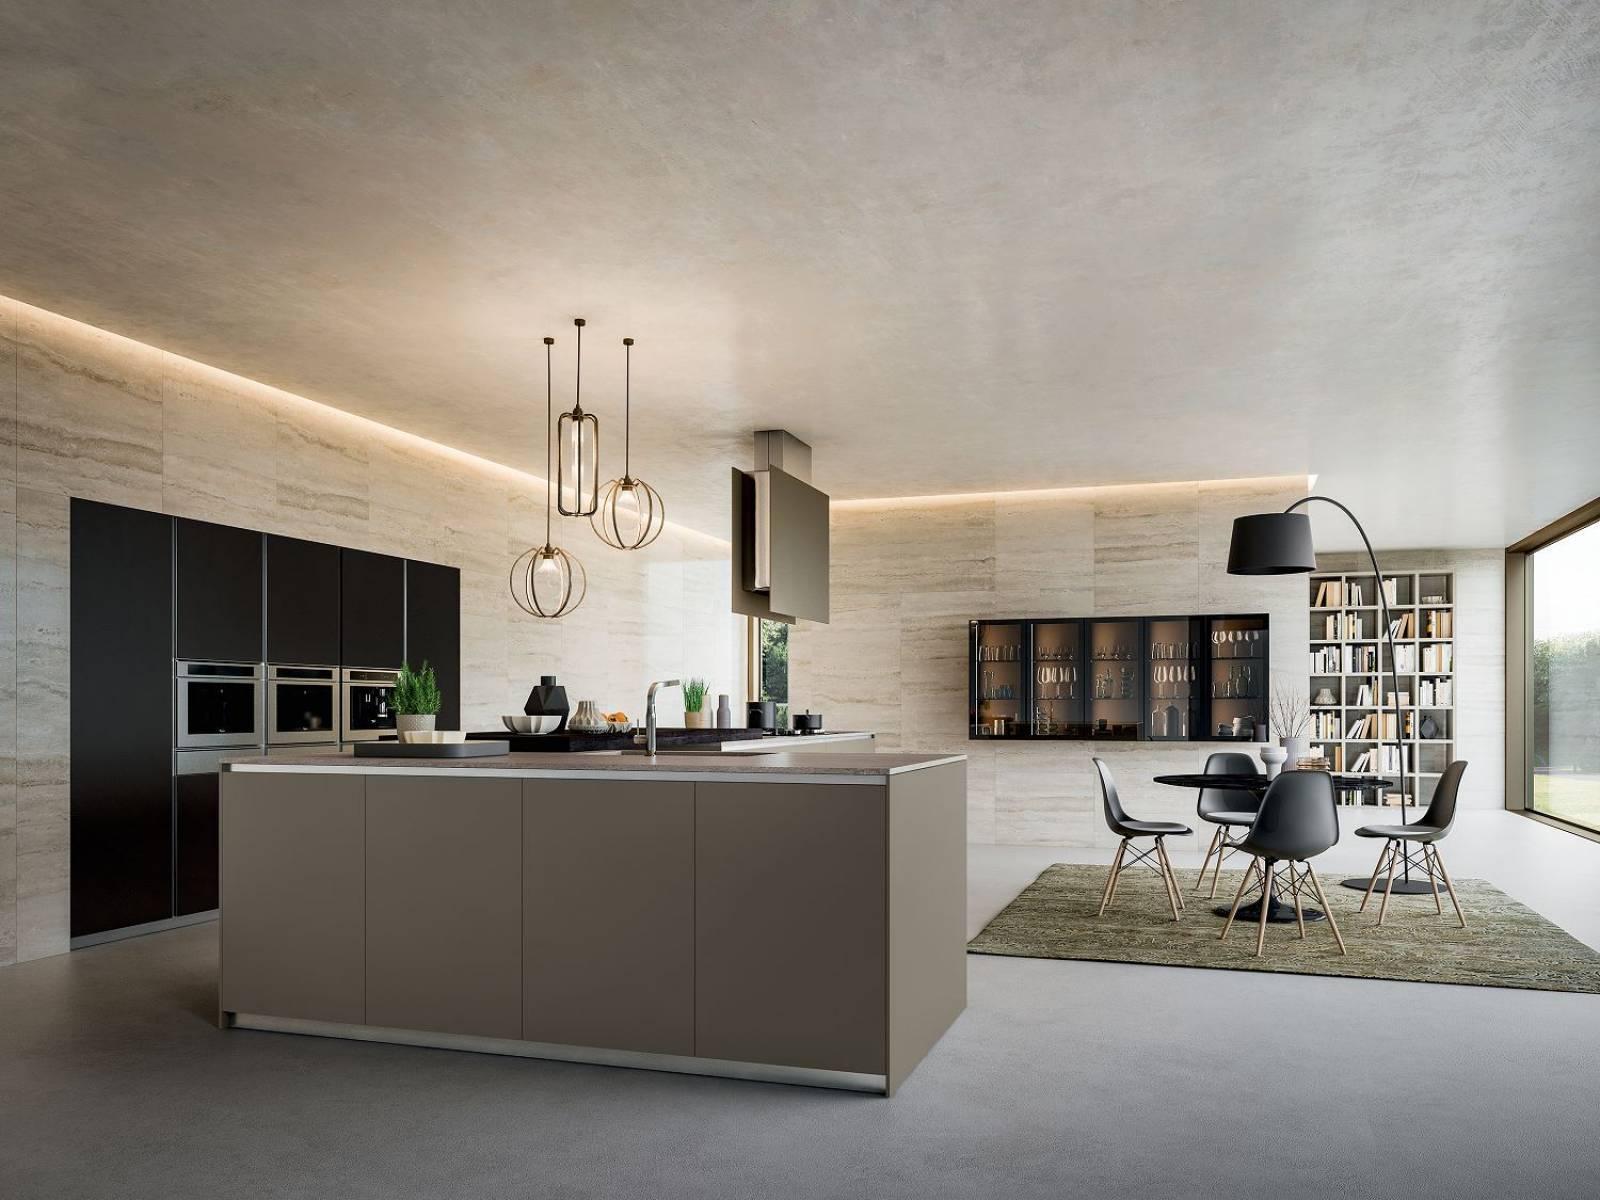 Cuisine moderne pur e laqu e blanc design cuisines for Cuisine epuree blanc